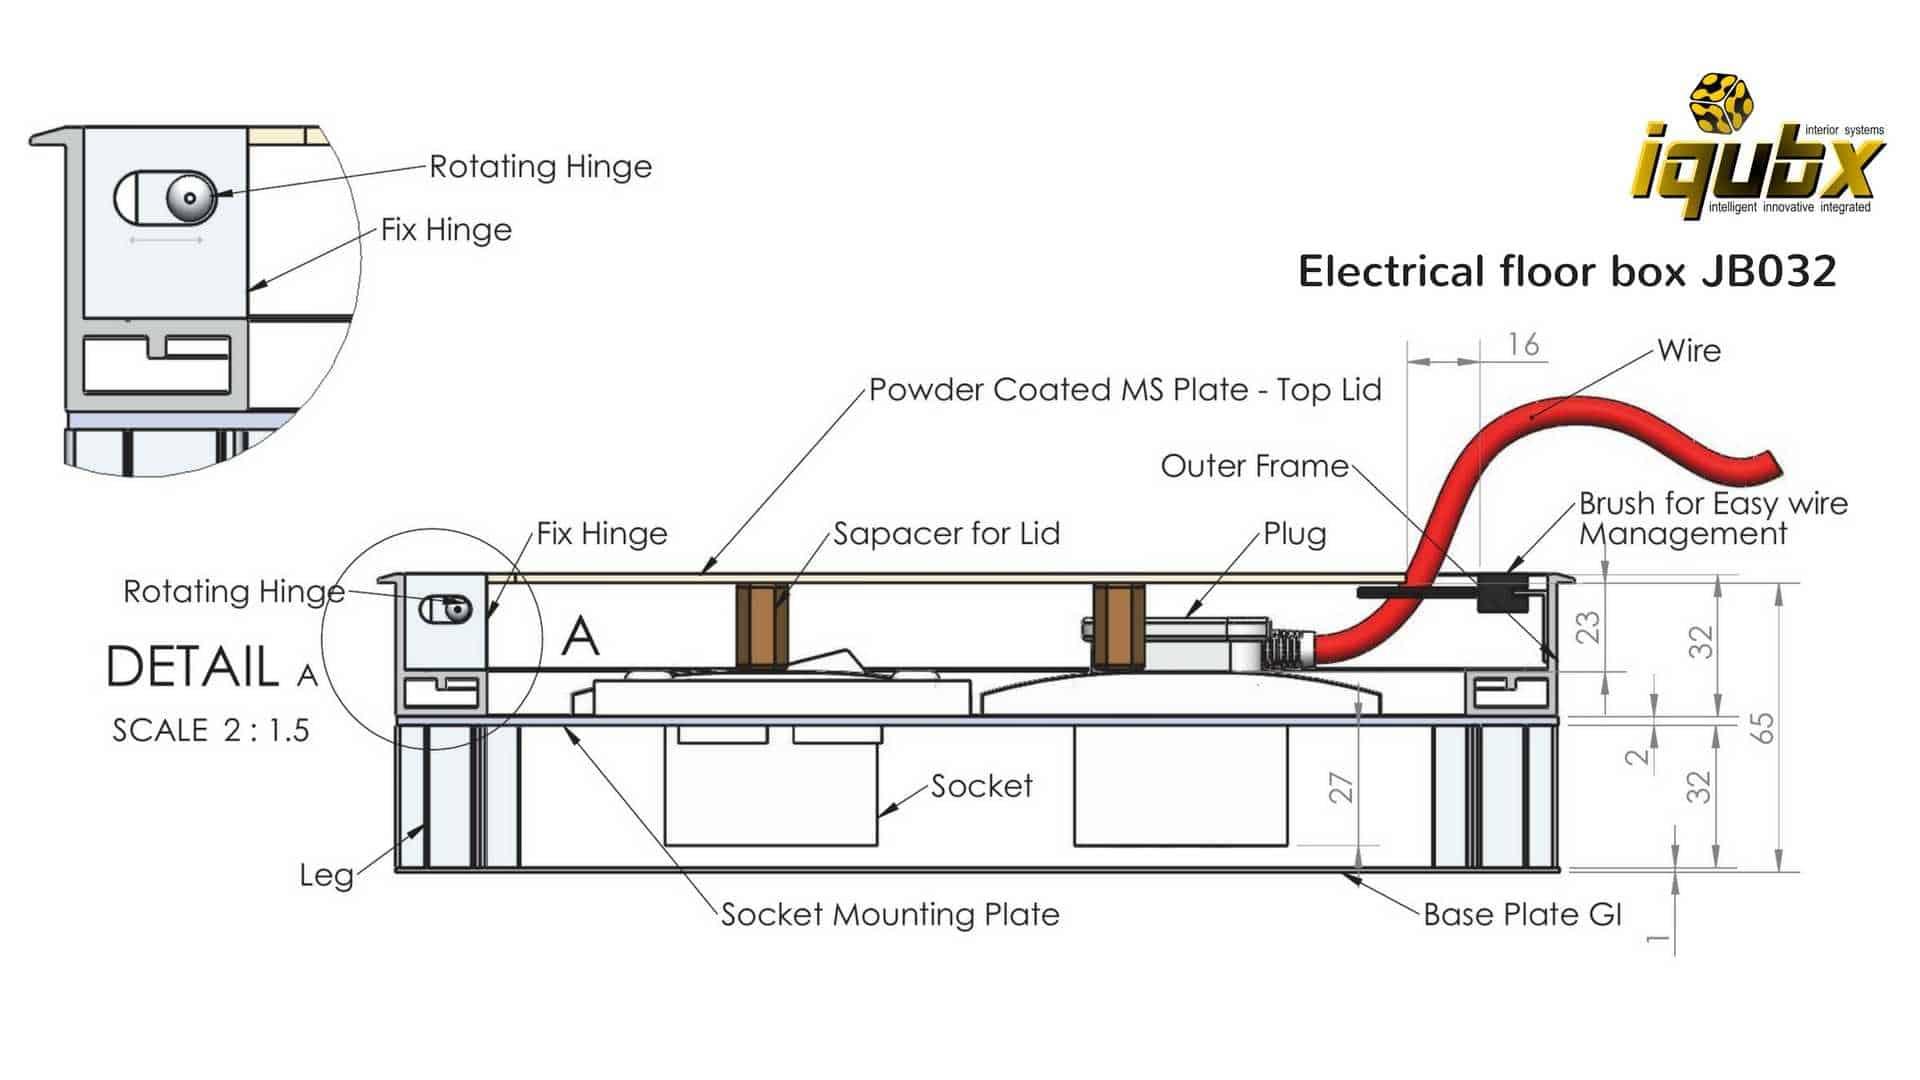 56 mercury montclair wiring diagram technical diagrams 1969 mercury cougar wiring diagram